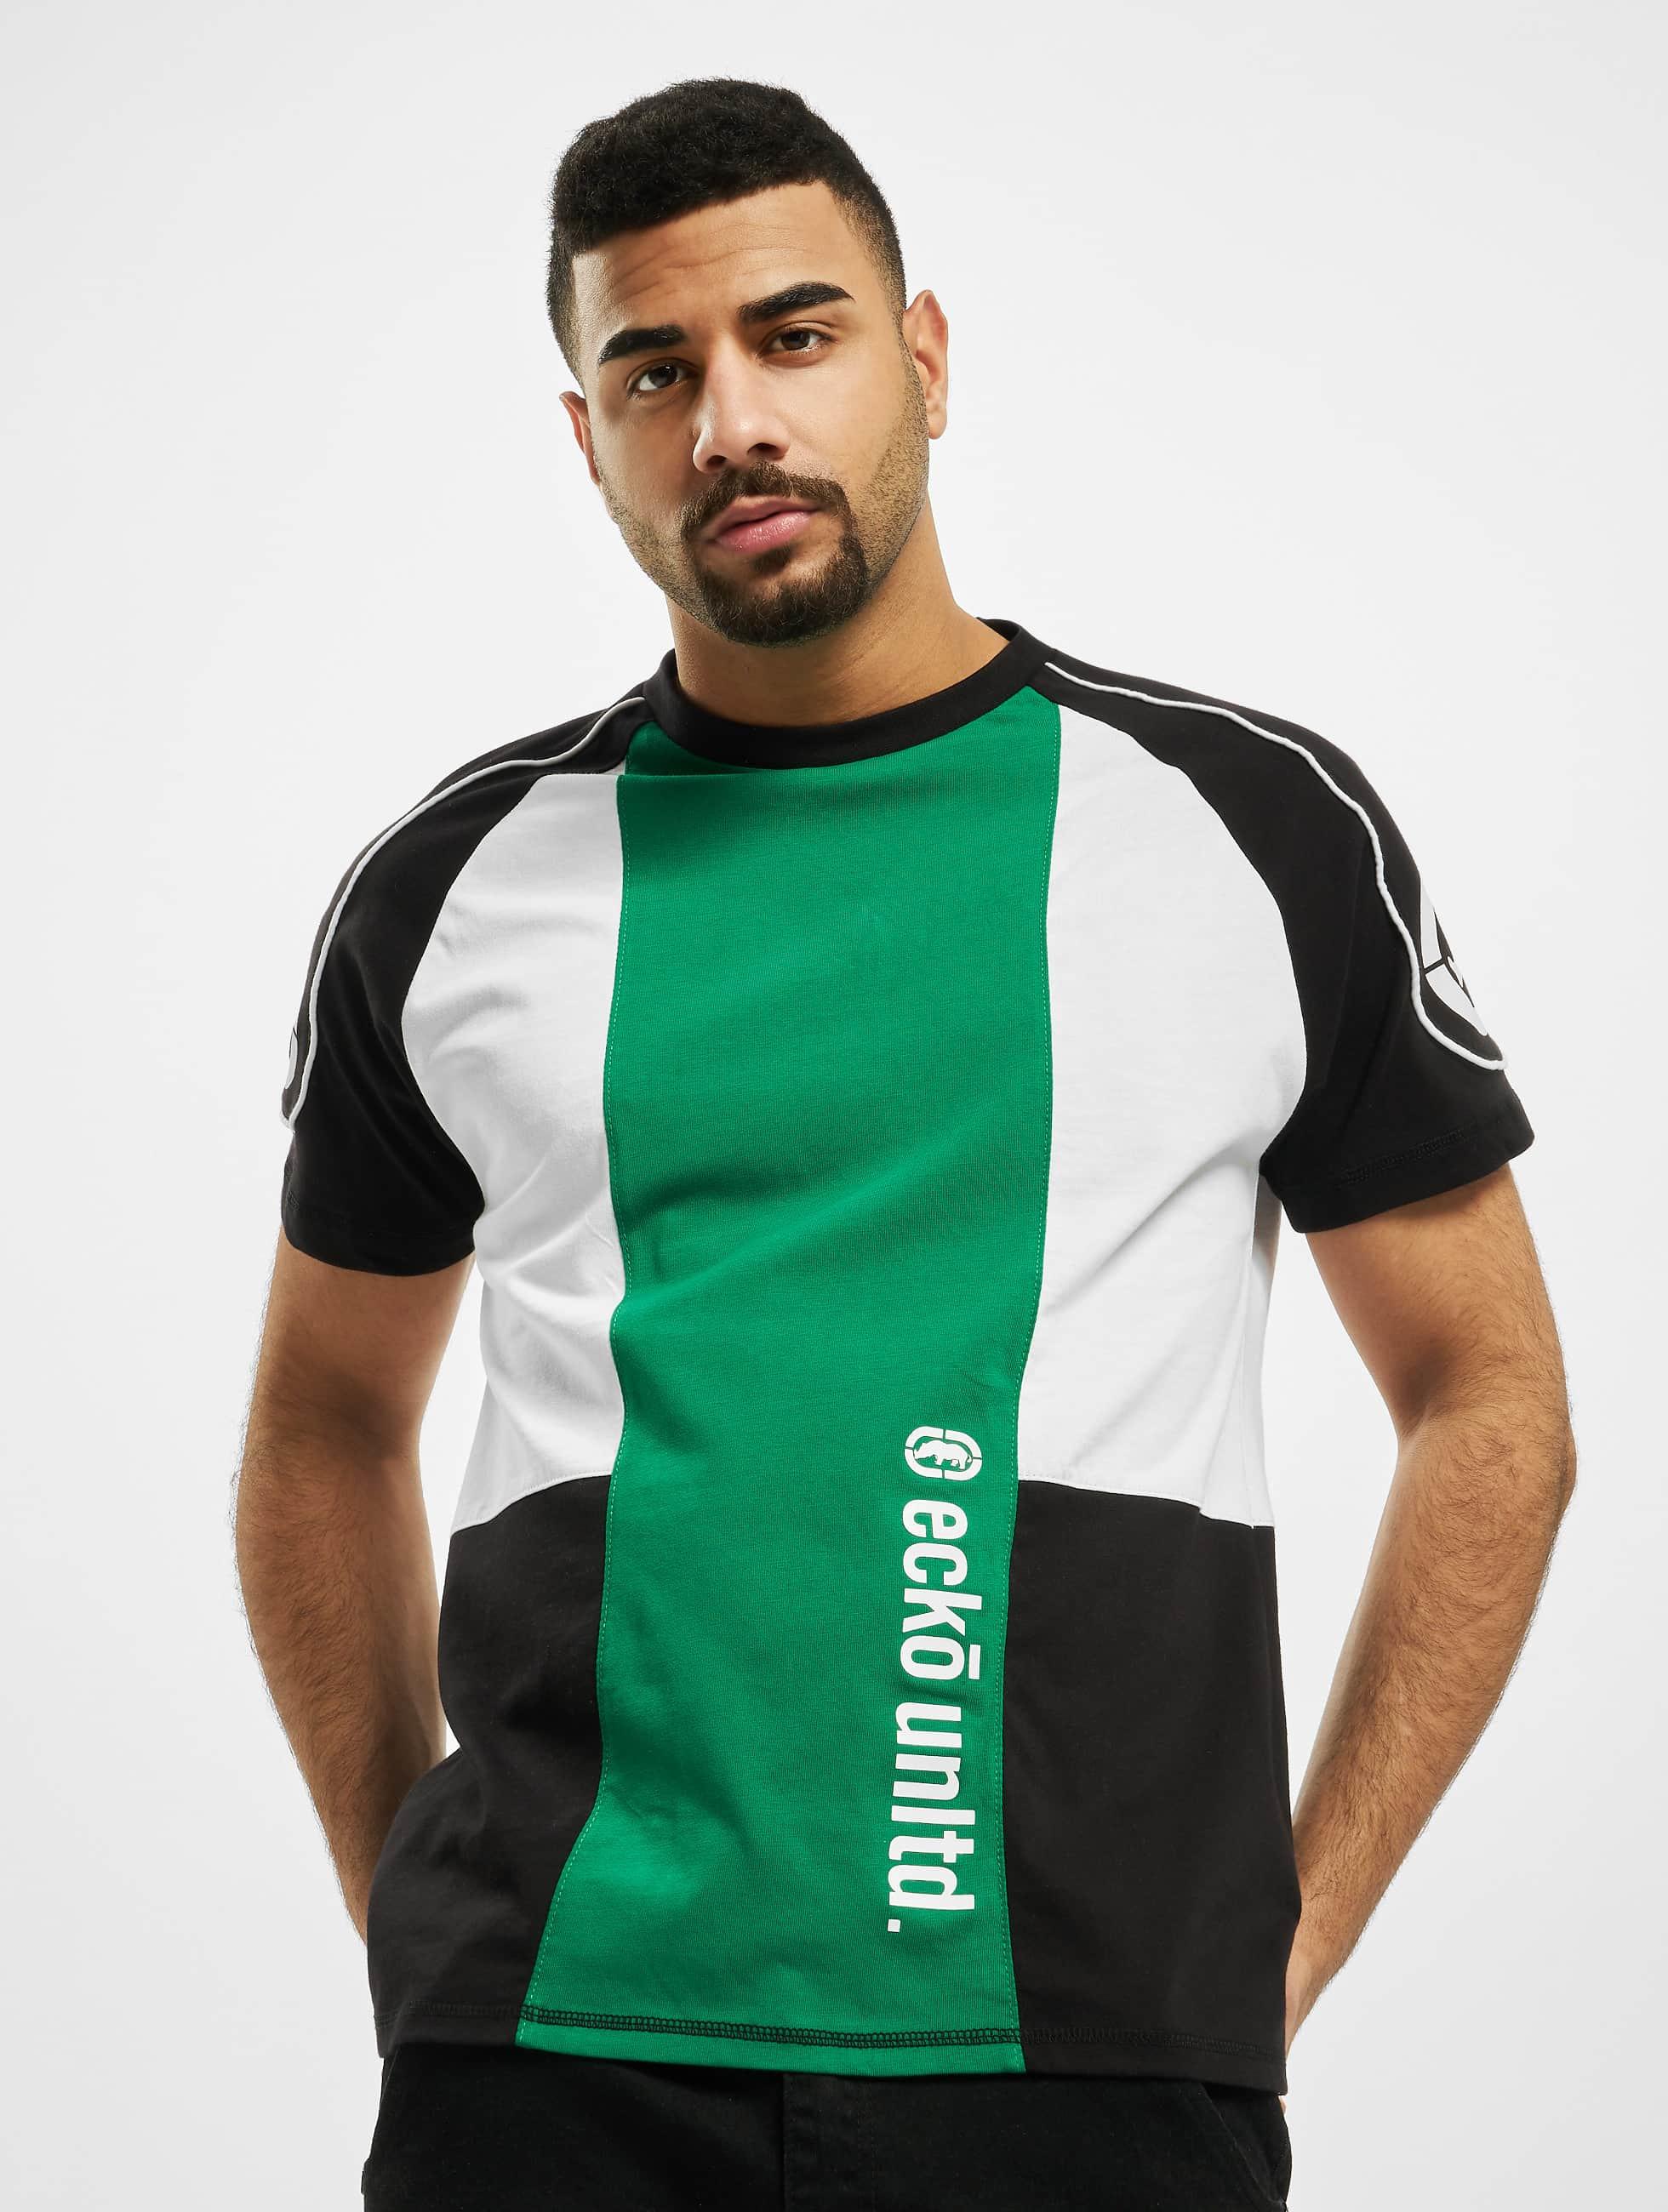 Ecko Unltd. / T-Shirt Allentown in black XL